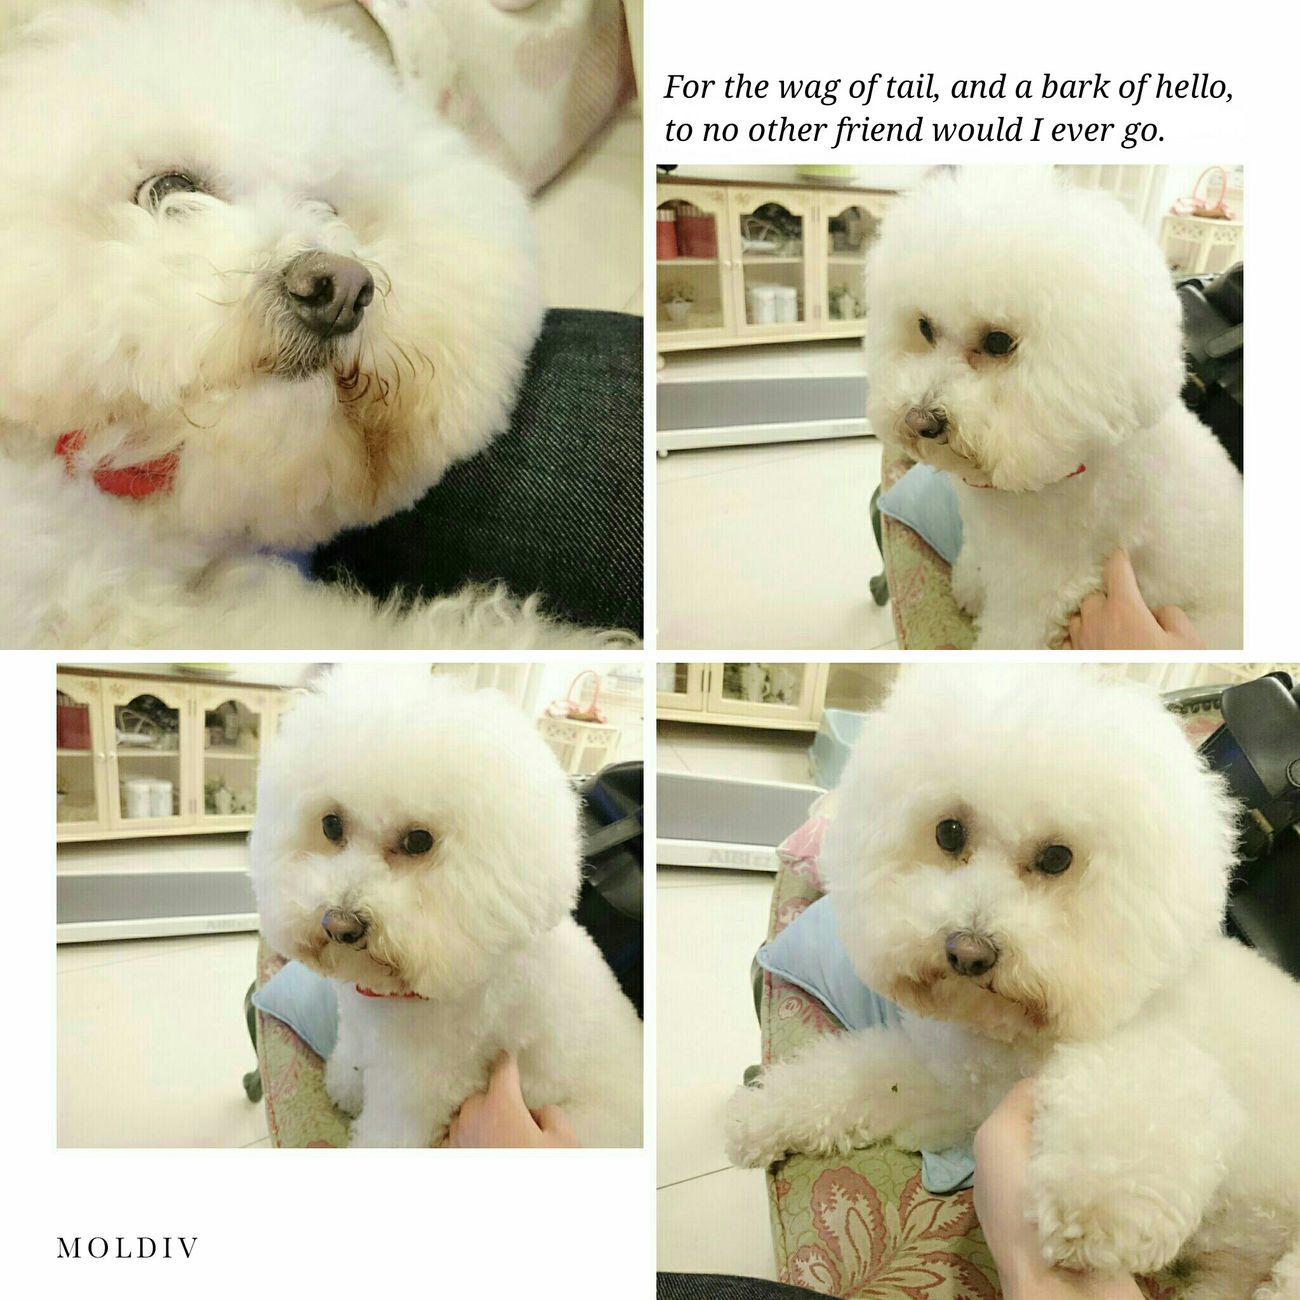 Lisa is waiting to go shopping with Mom? 比熊 比熊犬 寵物 Bichon Bichonfrise Puppy Dog Pet ビションフリーゼ Fluffy